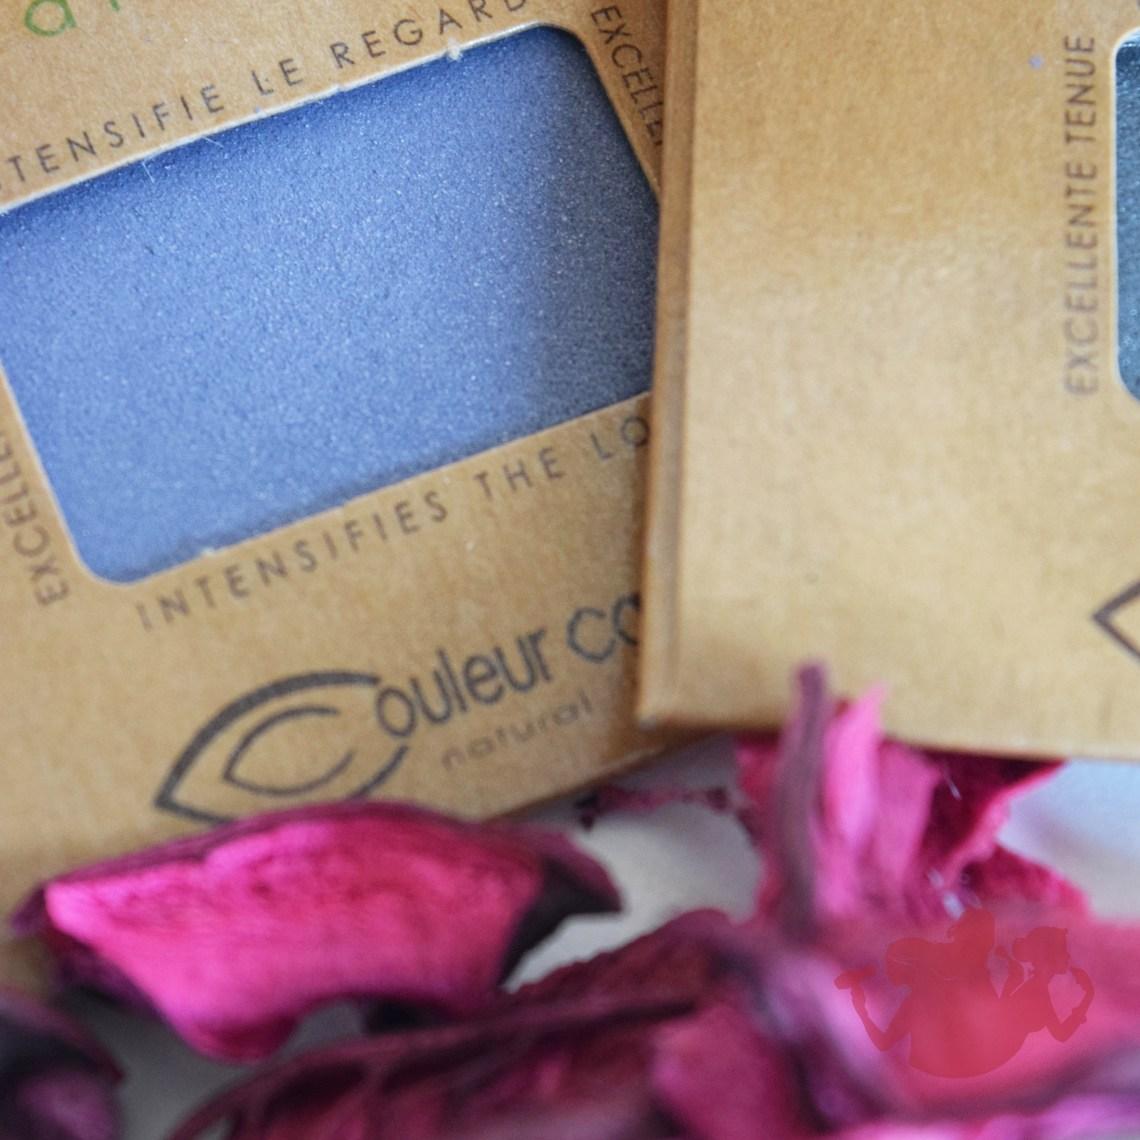 5 prodotti Couleur Caramel